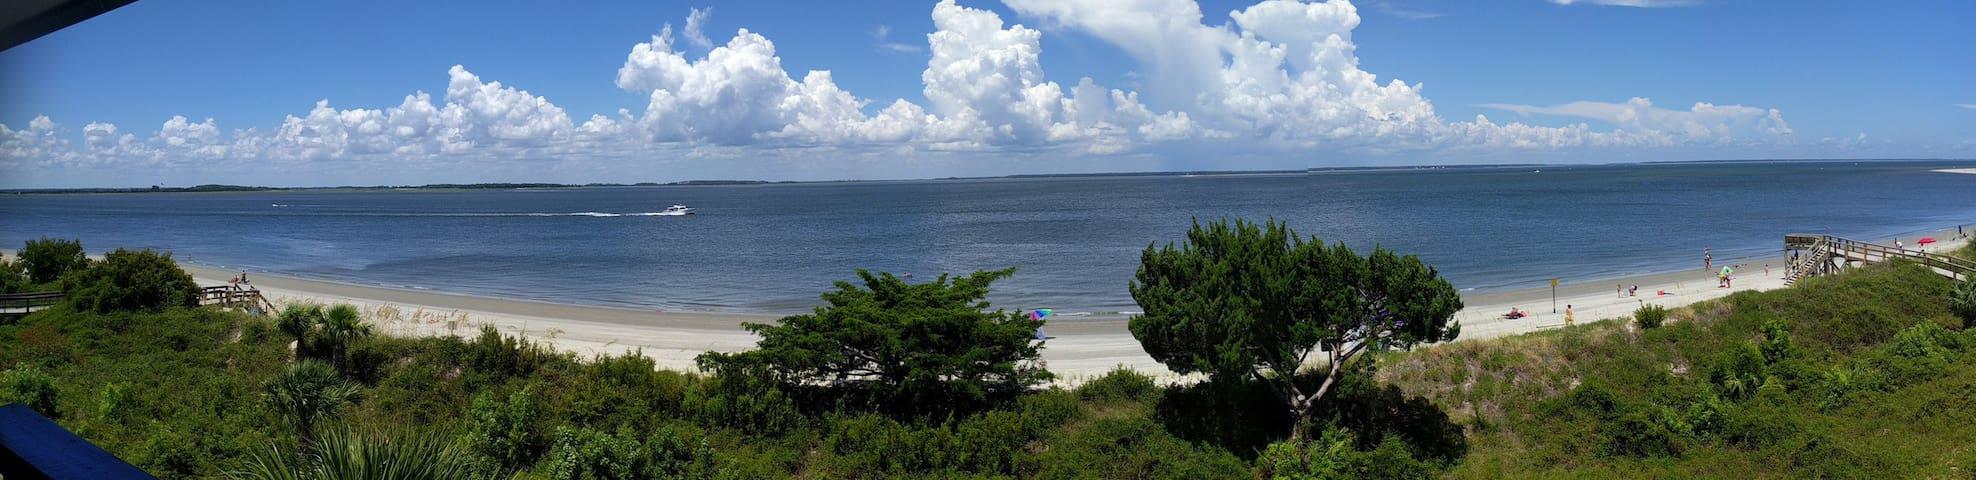 Sand Dollar - Beachfront Condo 1BR/1BA - Tybee Island - Condominium